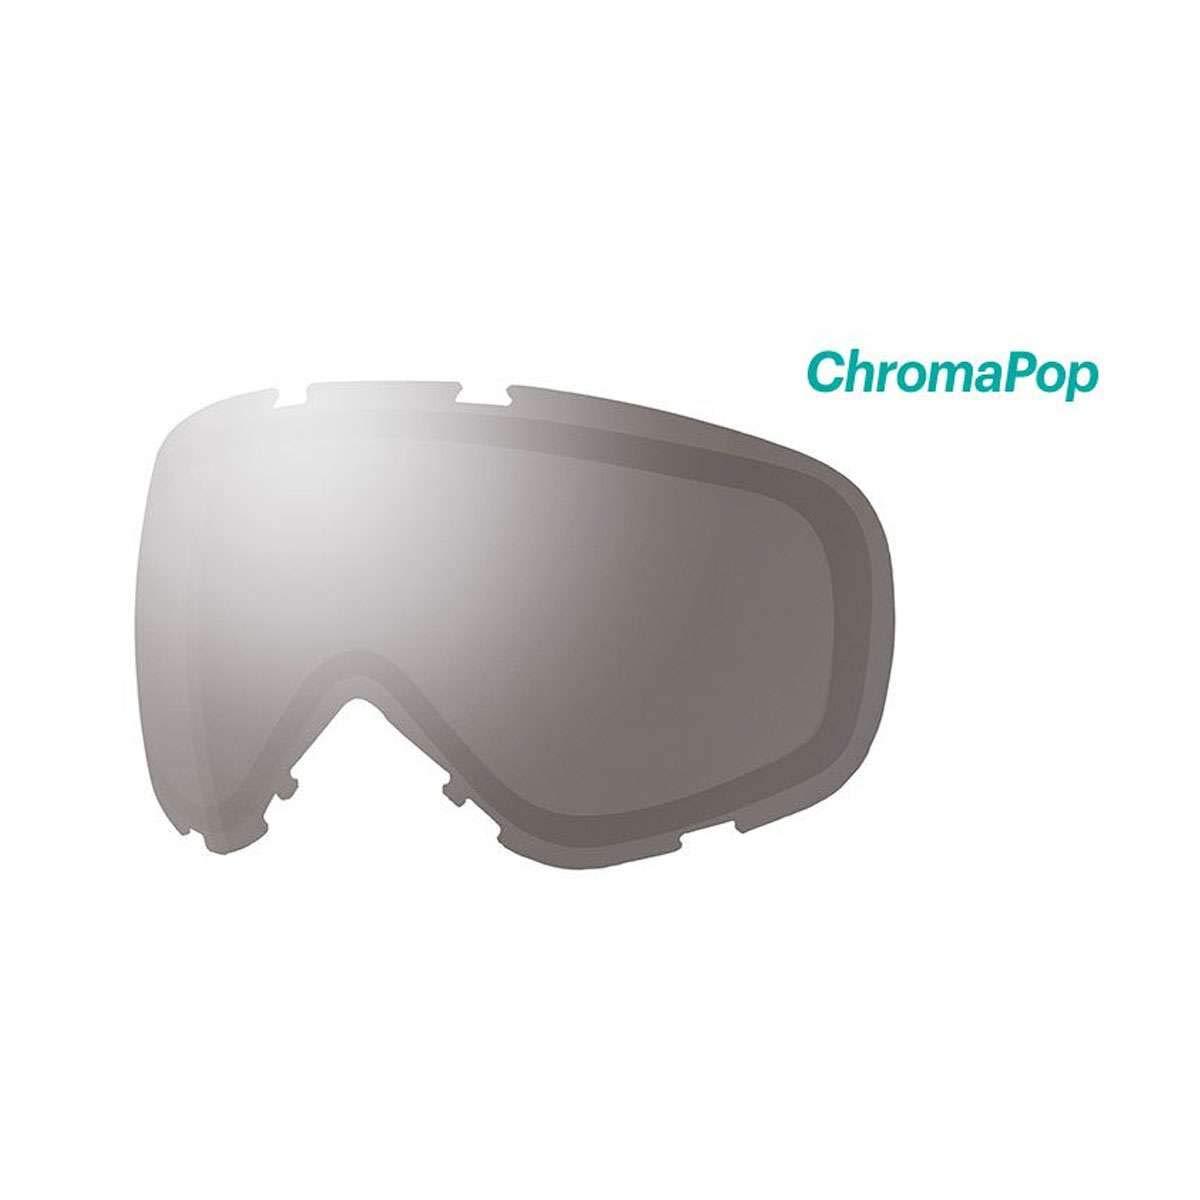 5b43c5b455 Amazon.com   Smith Optics Phenom Turbo Adult Replacement Lense Snow Goggles  Accessories - Chromapop Everyday Green Mirror One Size   Sports   Outdoors